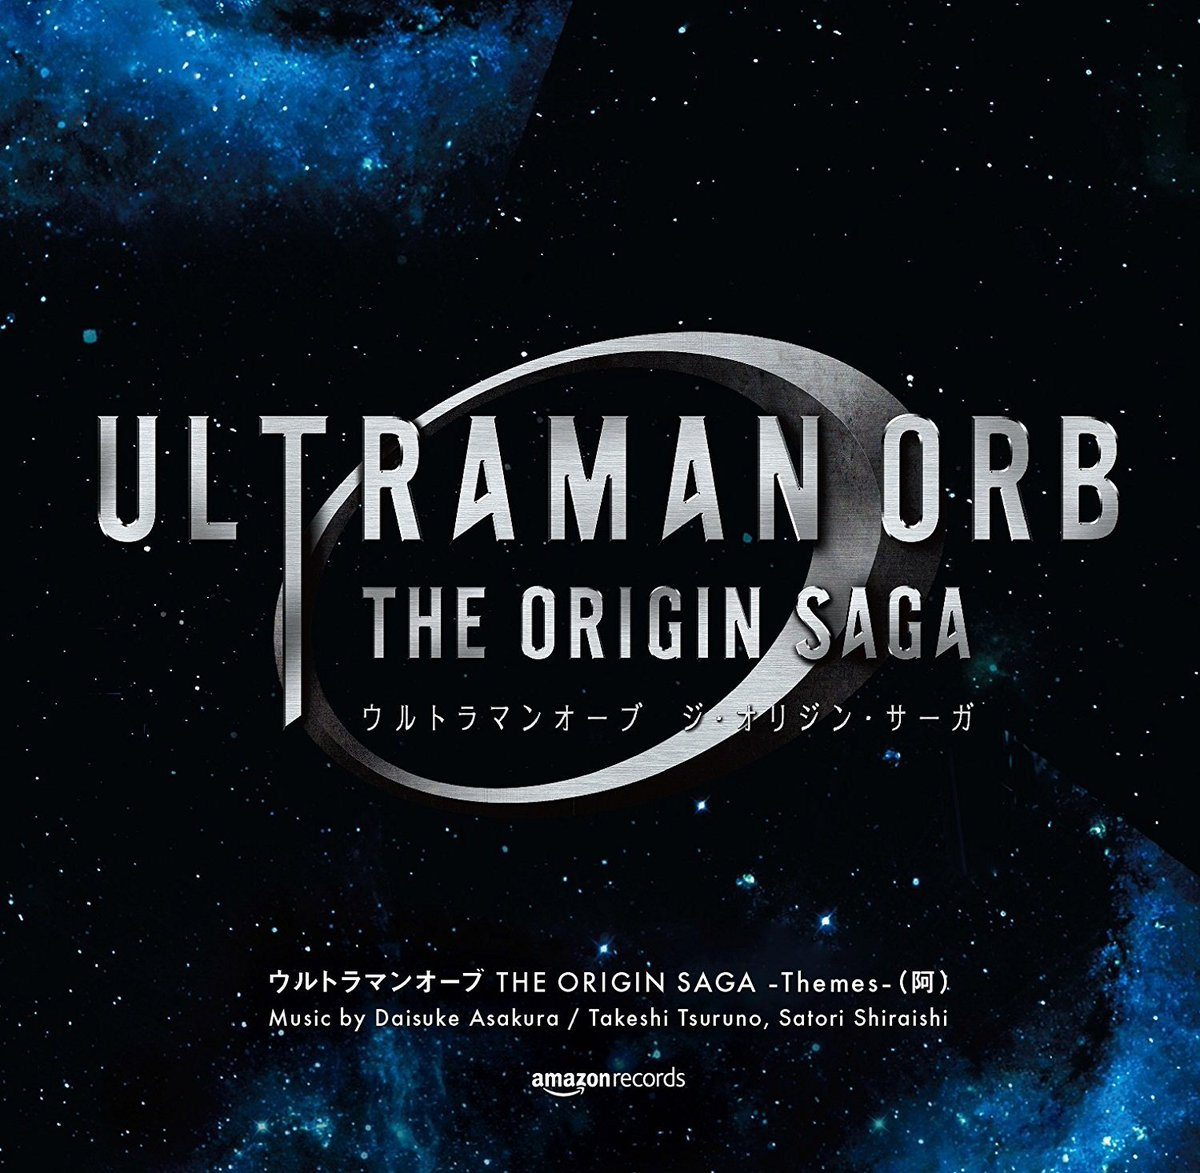 test ツイッターメディア - #nowplaying シライシ紗トリ - Ultraman Orb - Touch the Sun - https://t.co/CW5agwZLrG